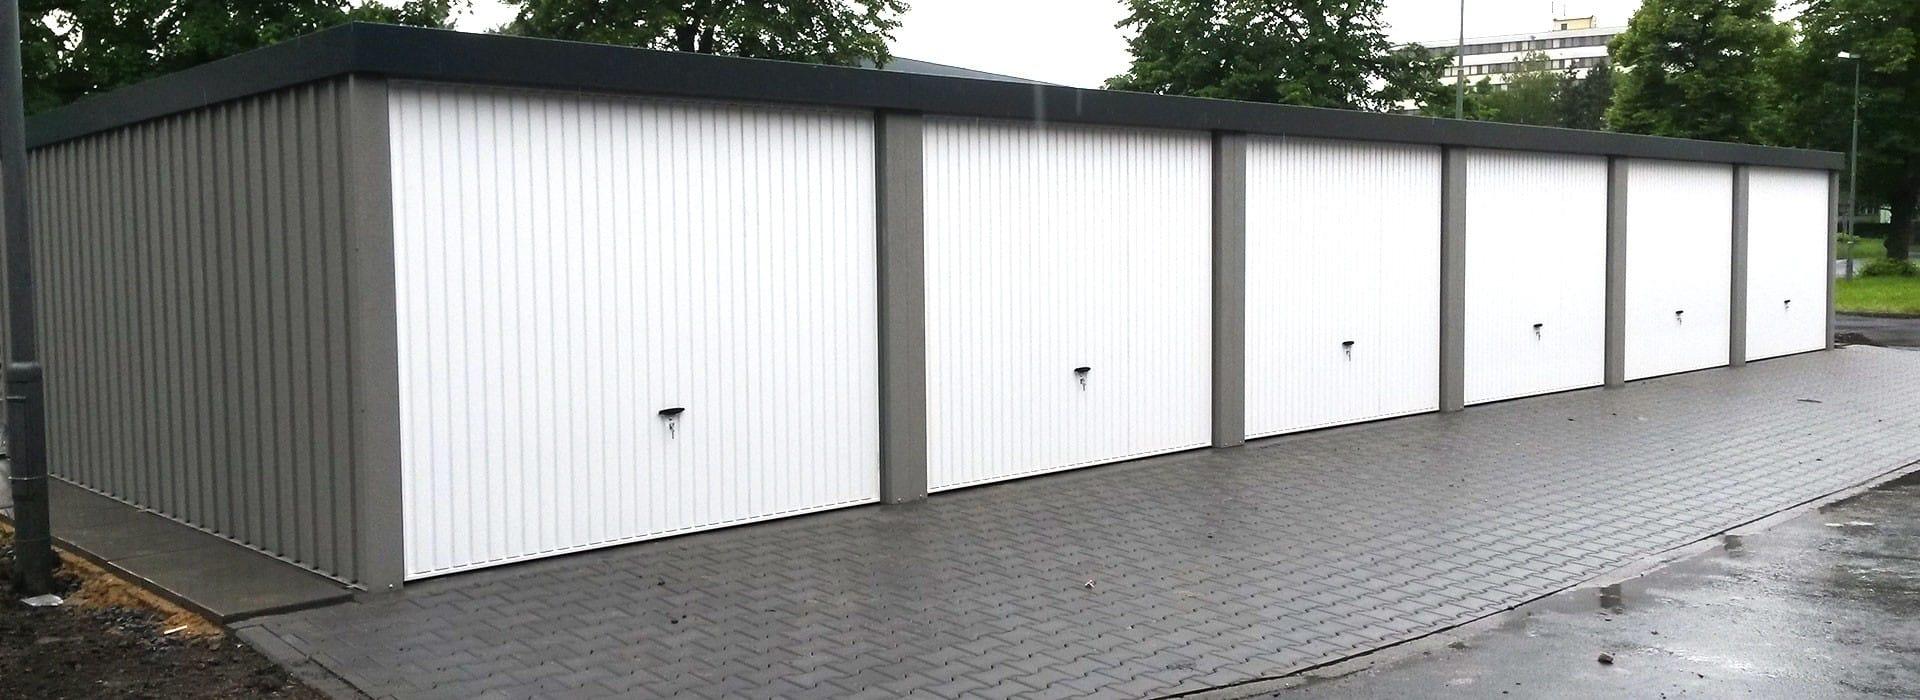 Plechové garáže s omietkou